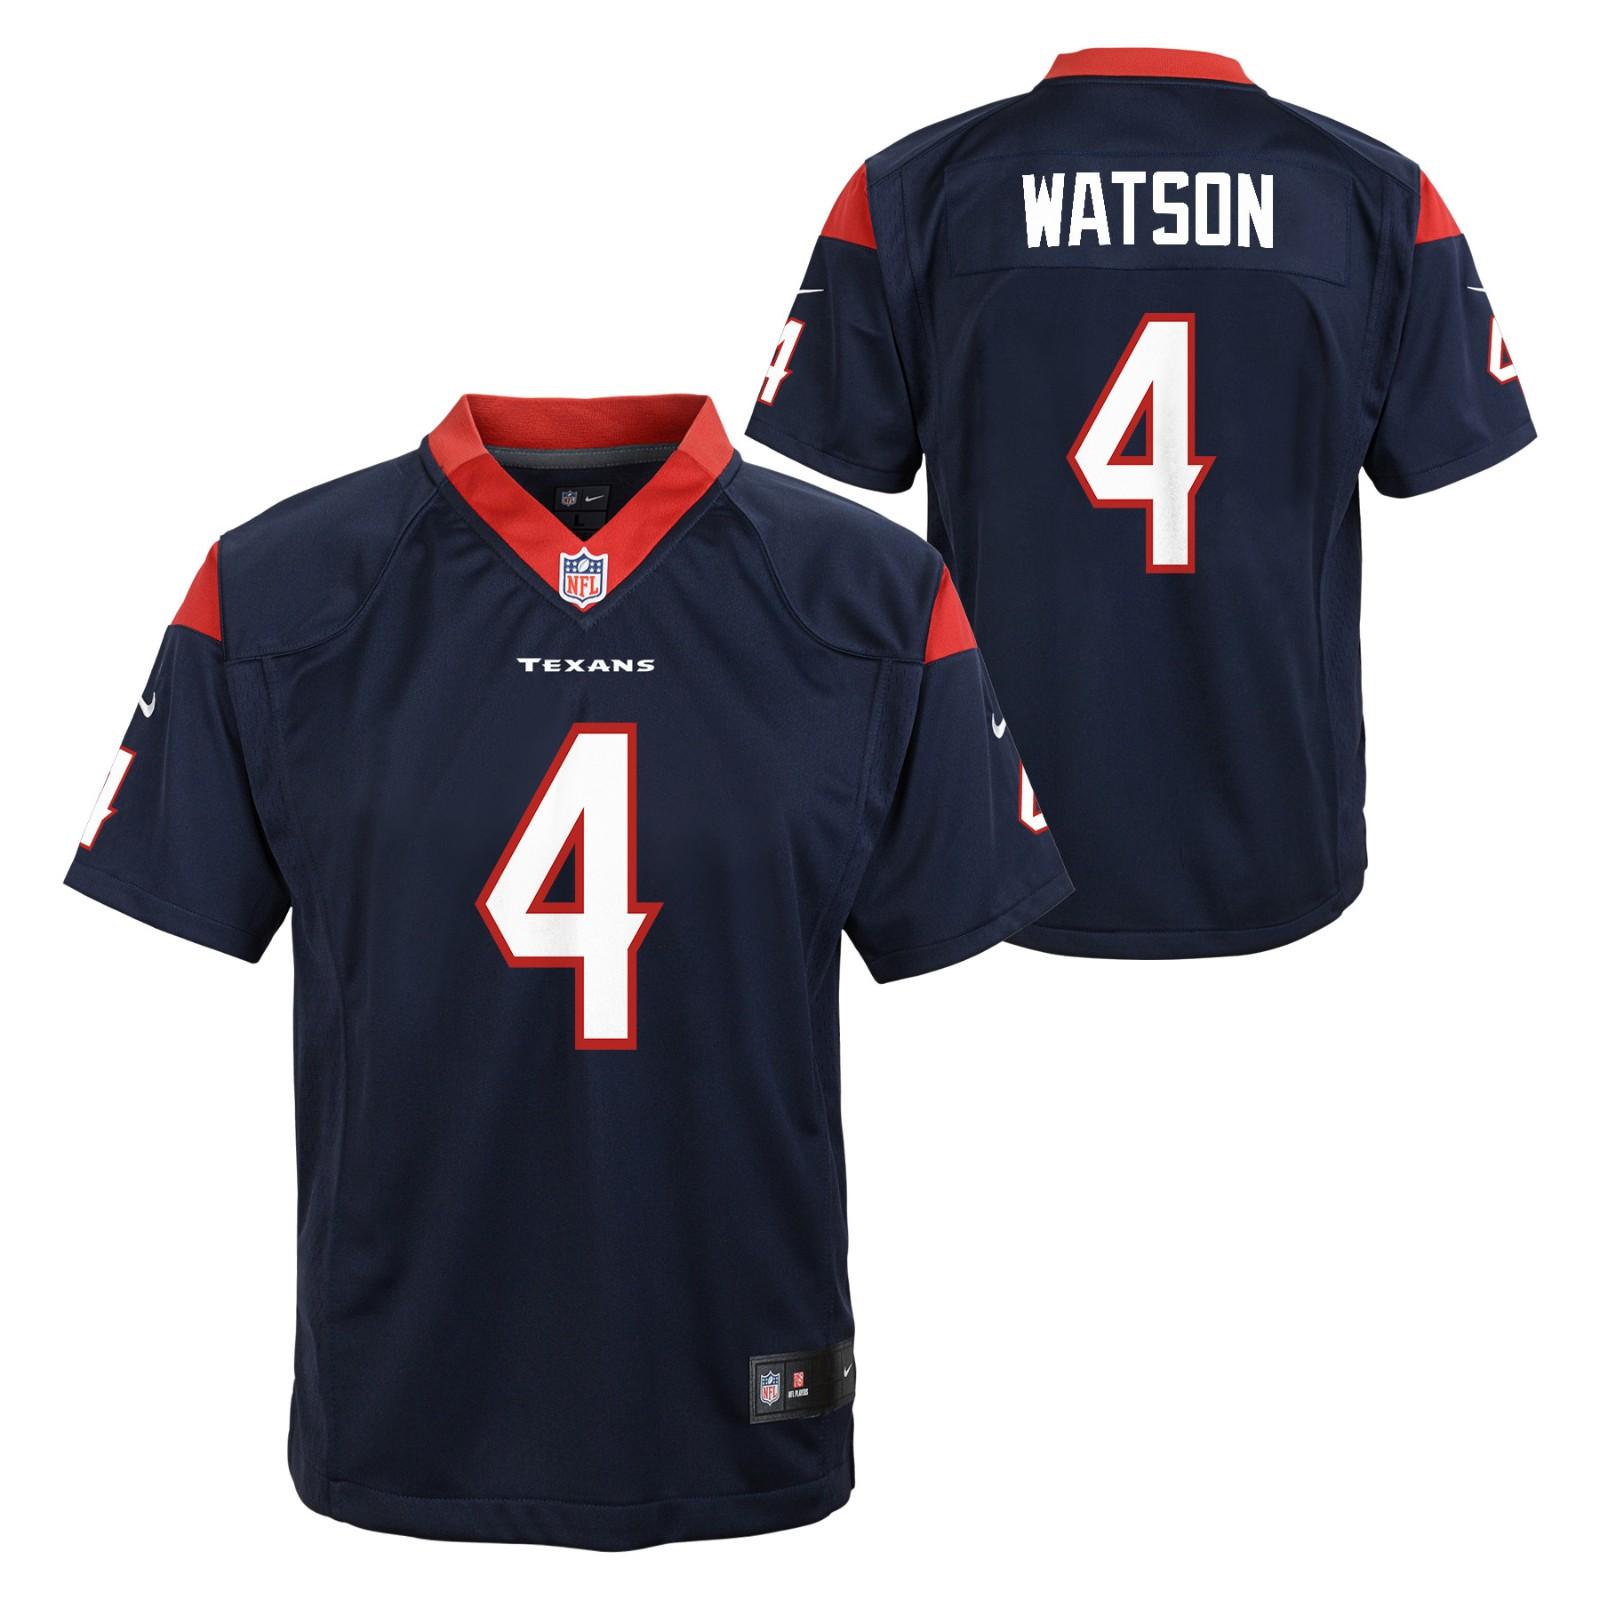 premium selection 707e5 6972a Details about Deshaun Watson Houston Texans NFL Nike Youth Navy Blue Game  Jersey